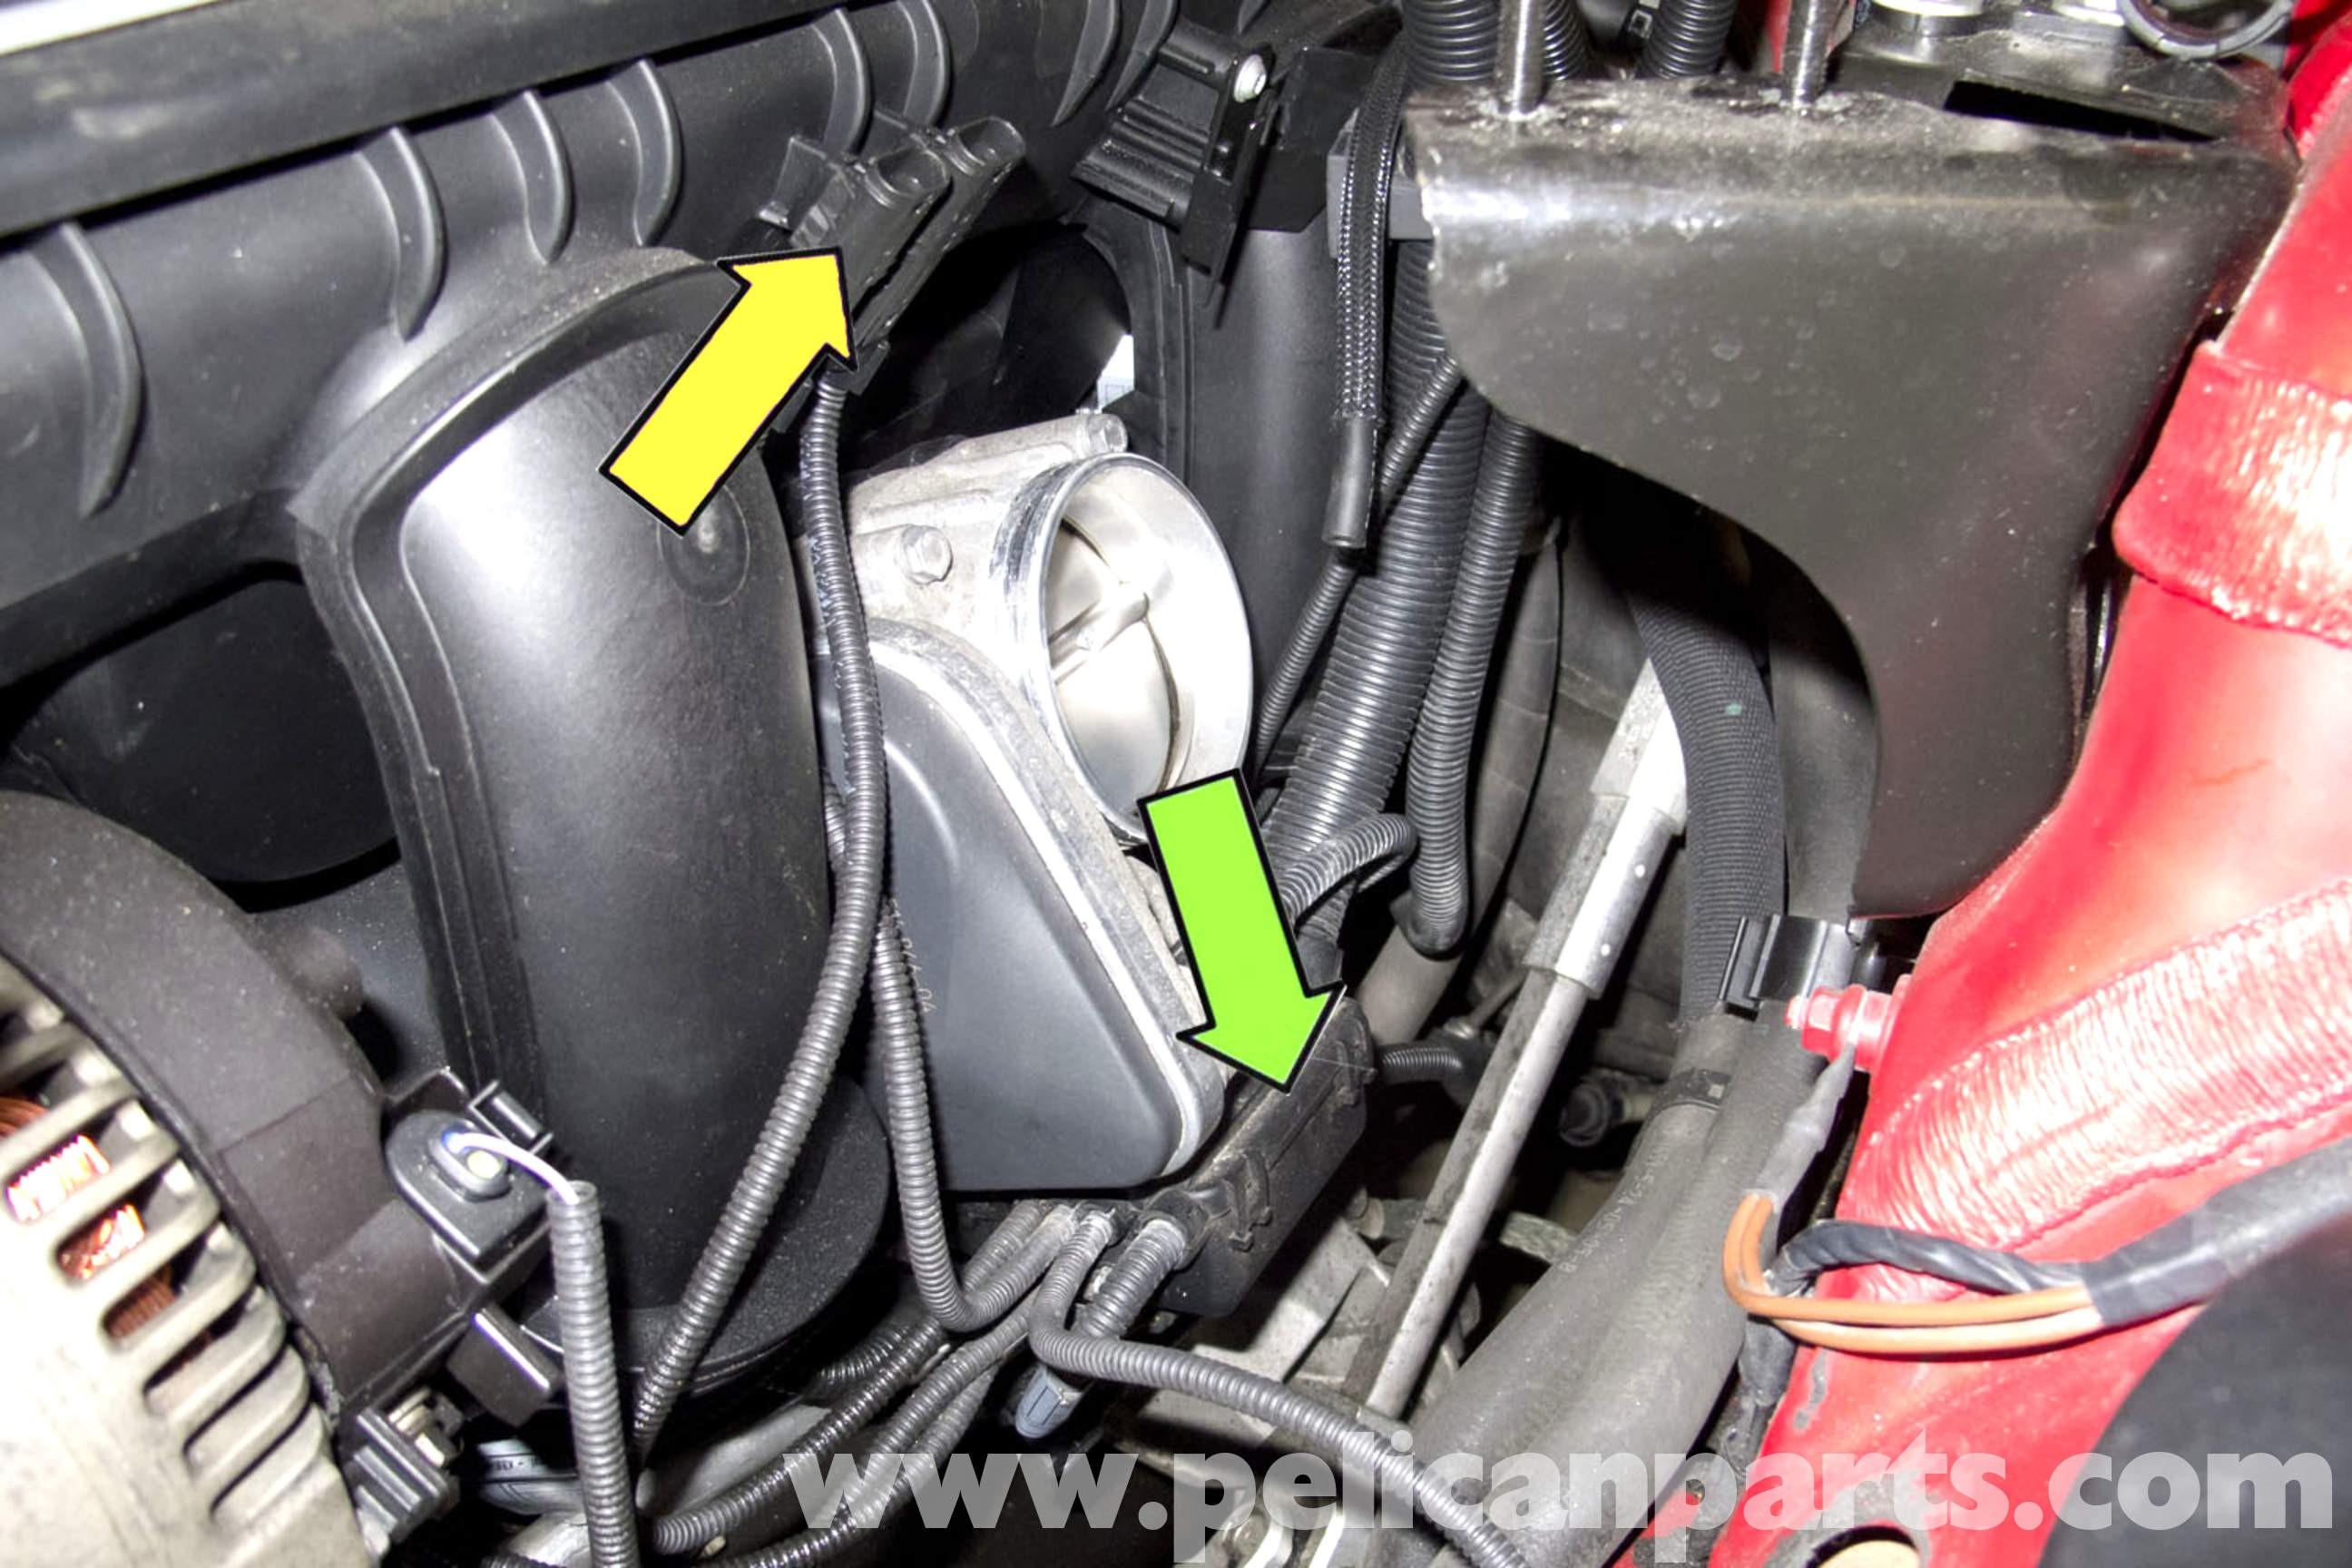 2007 Bmw 328i Engine Diagram My Wiring E90 Intake Manifold Replacement E91 E92 E93 Of